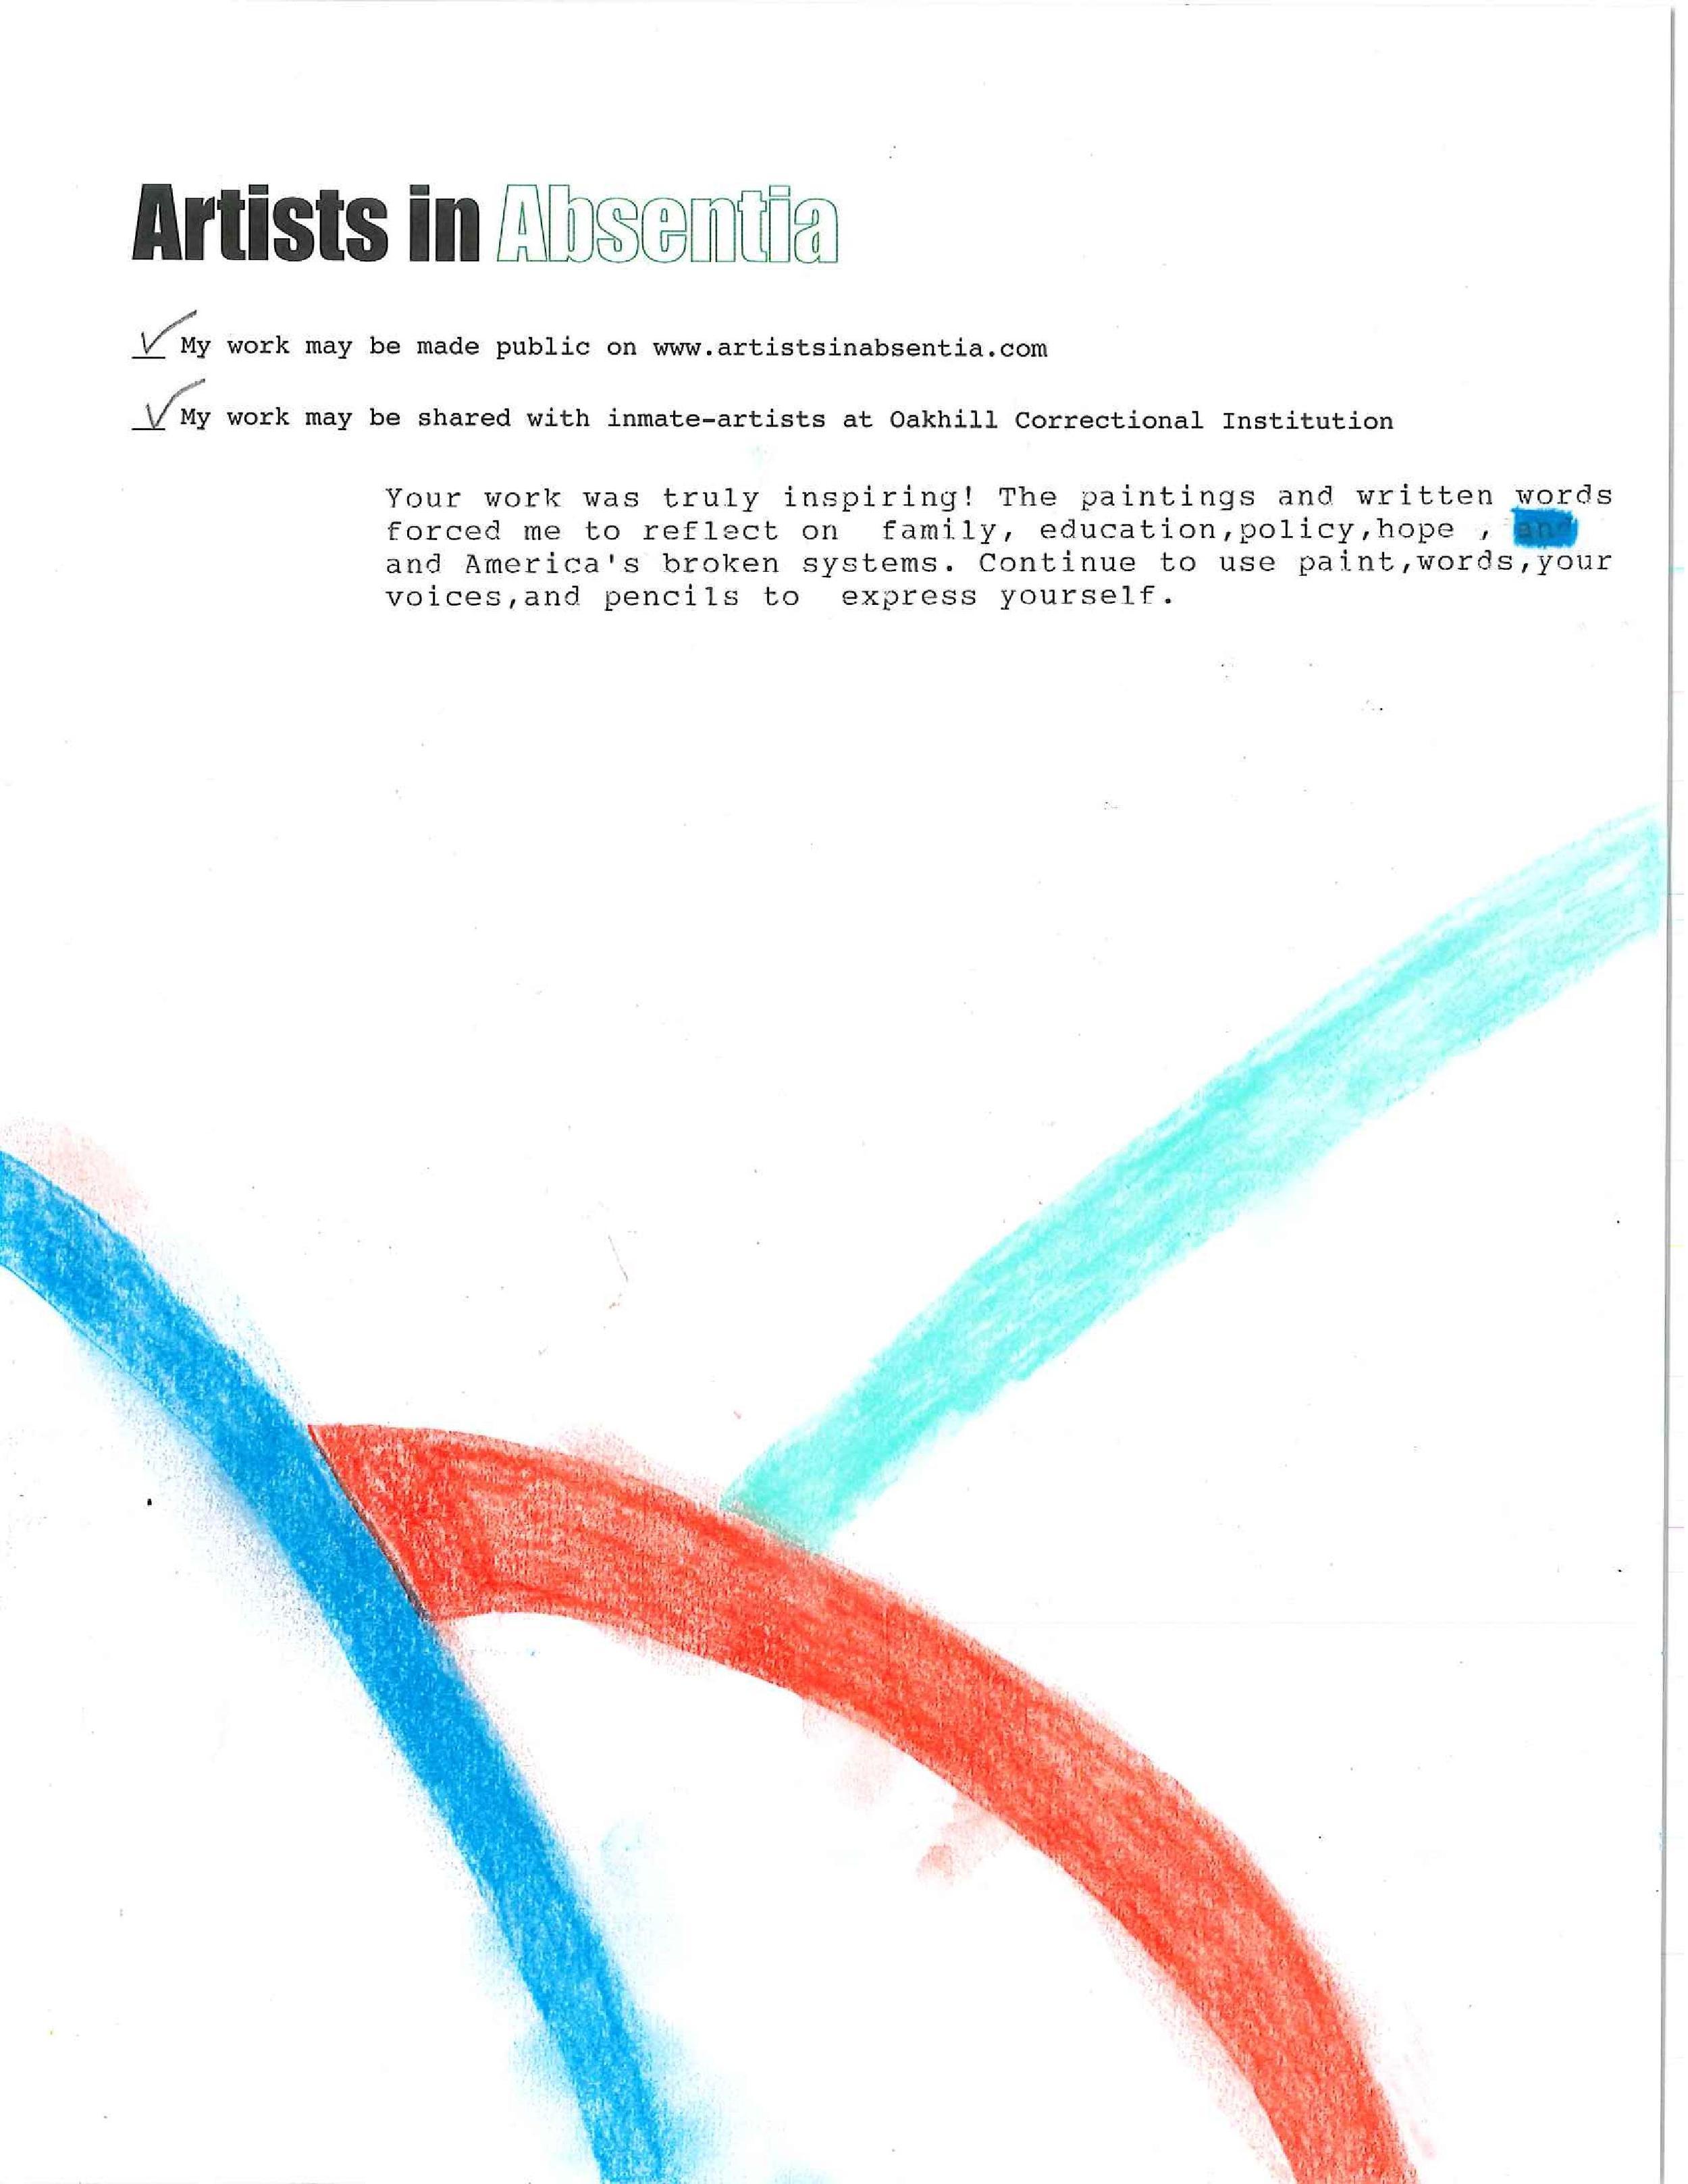 03-11-16-page-001.jpg